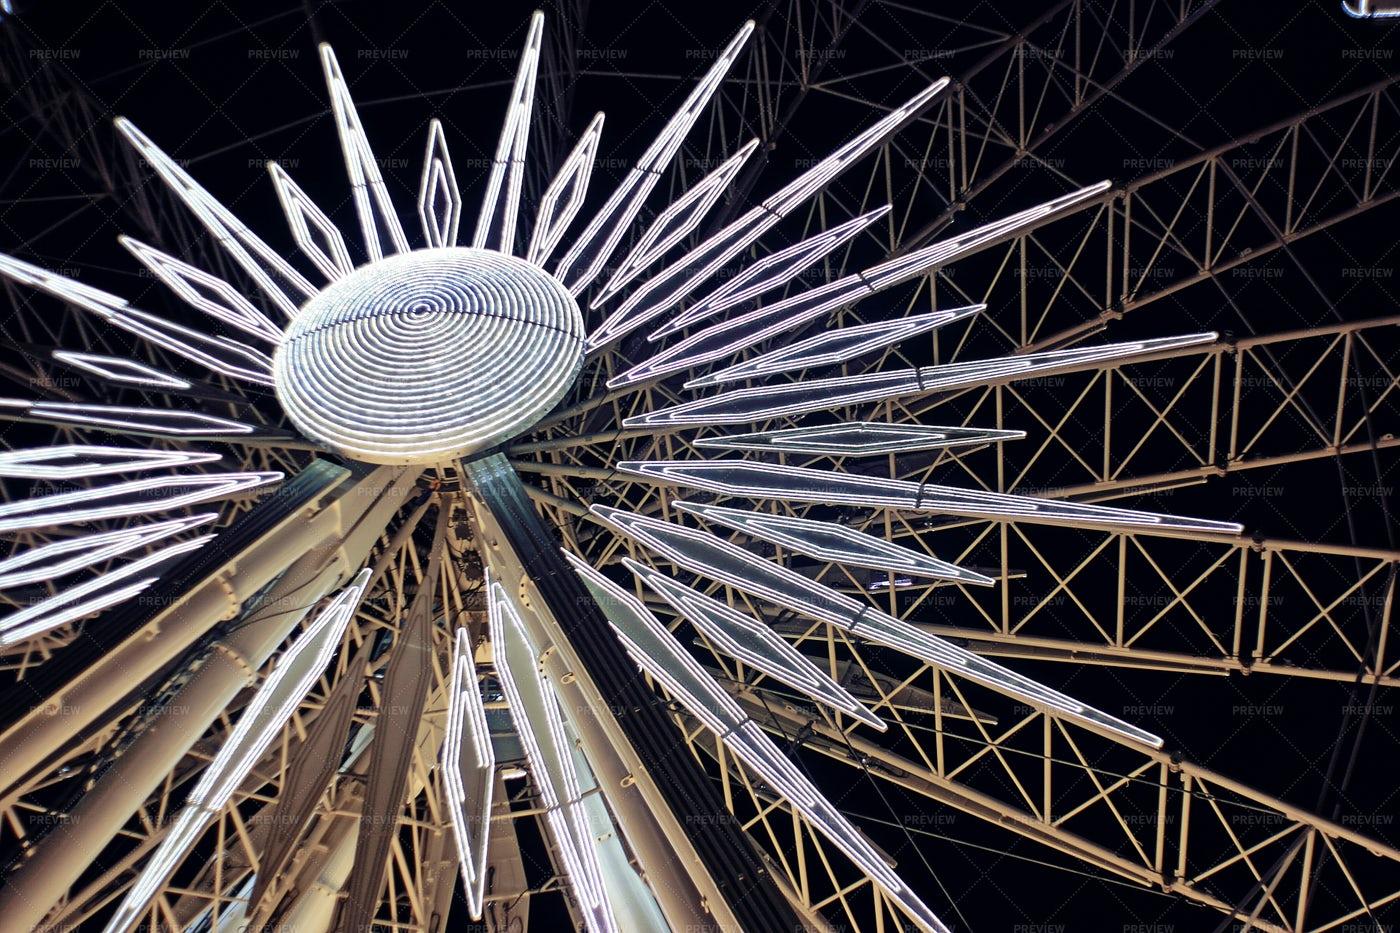 Ferris Wheel With Night Lights: Stock Photos